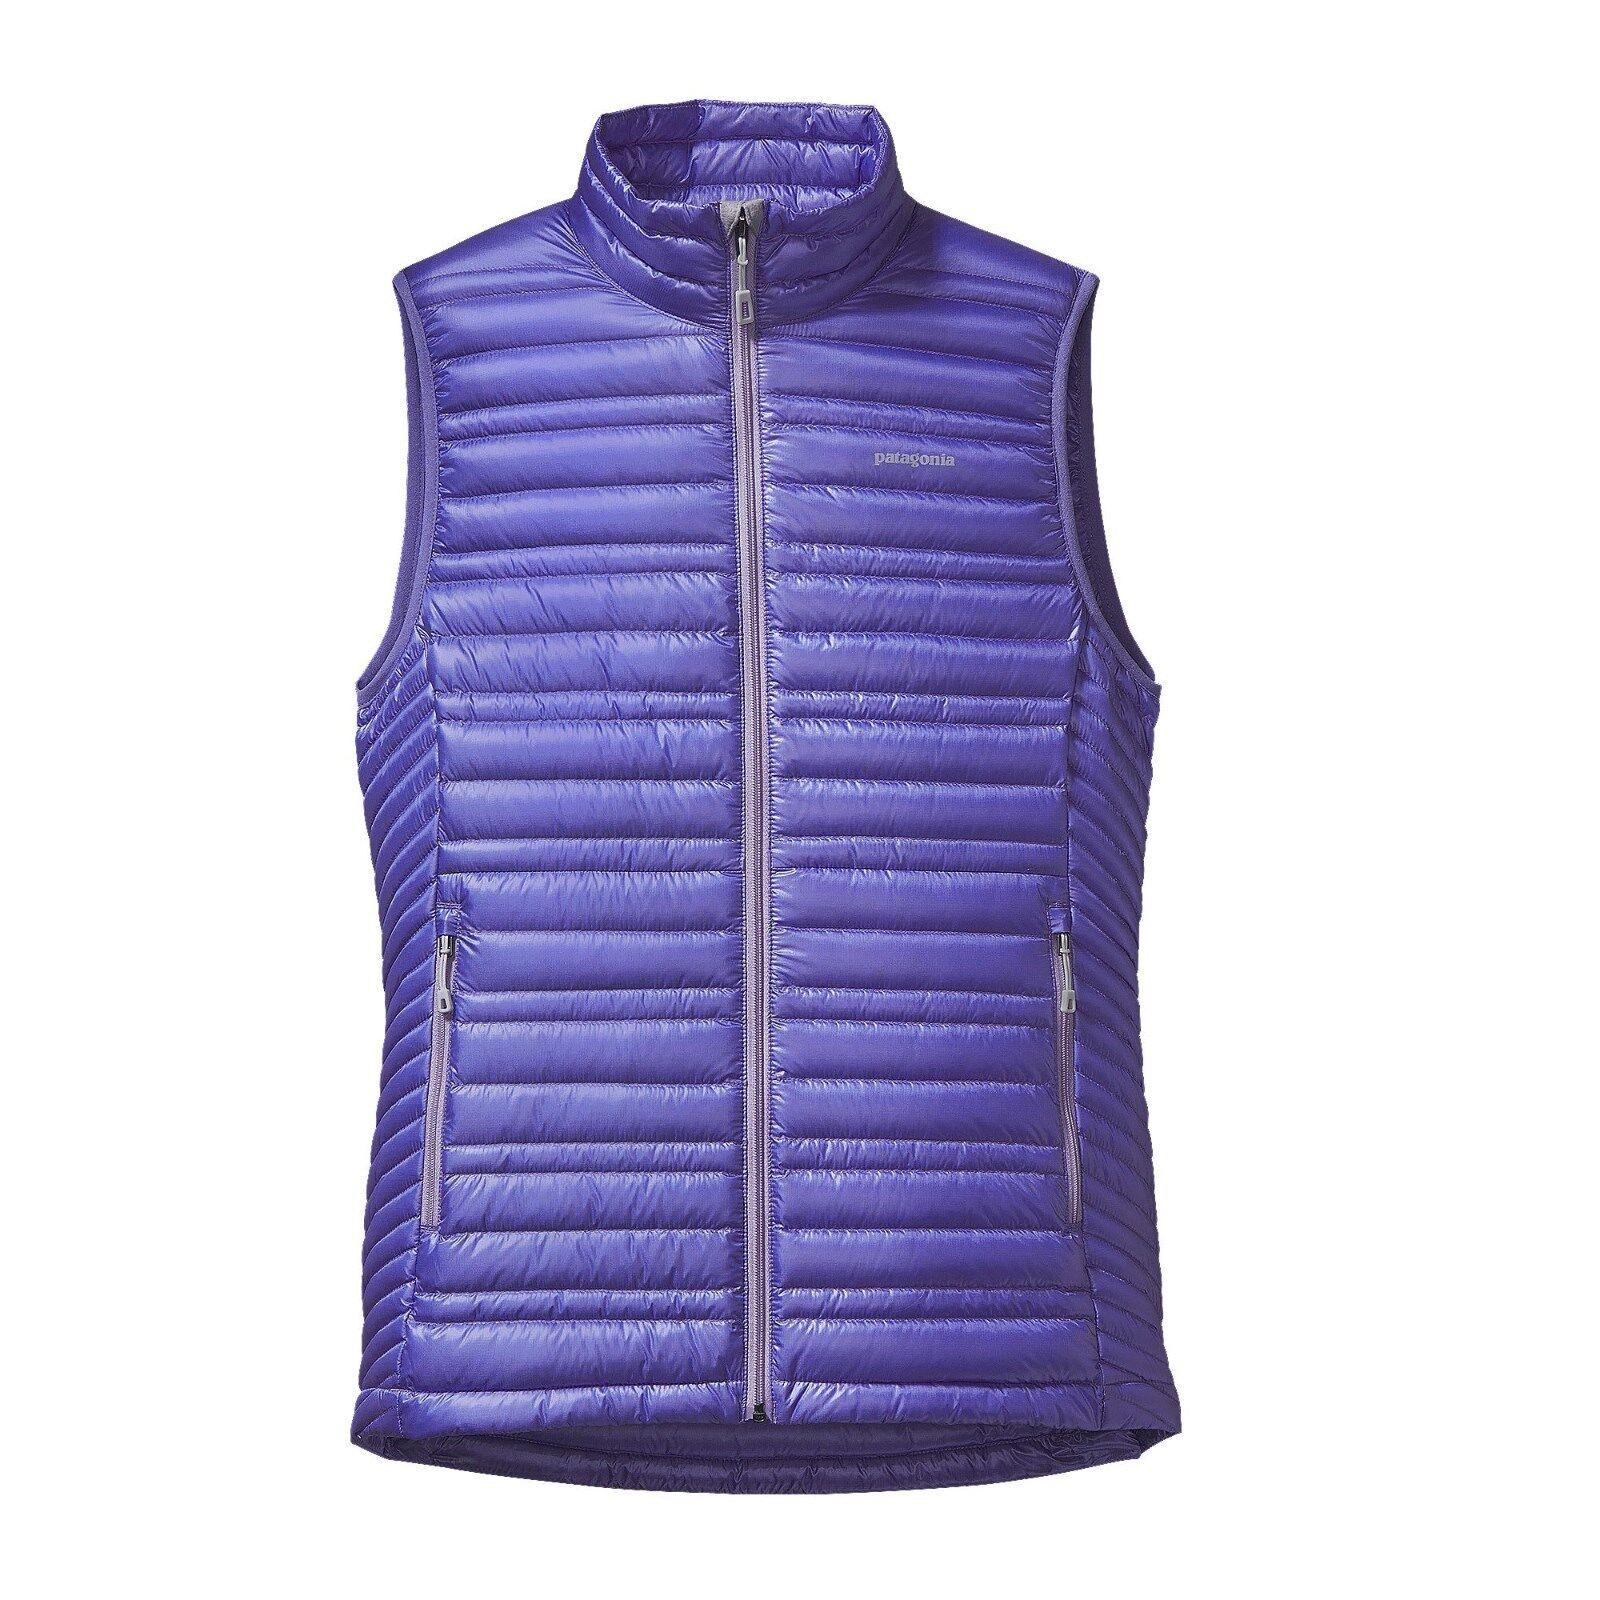 Patagonia Women's Ultralight Down Vest Size Medium